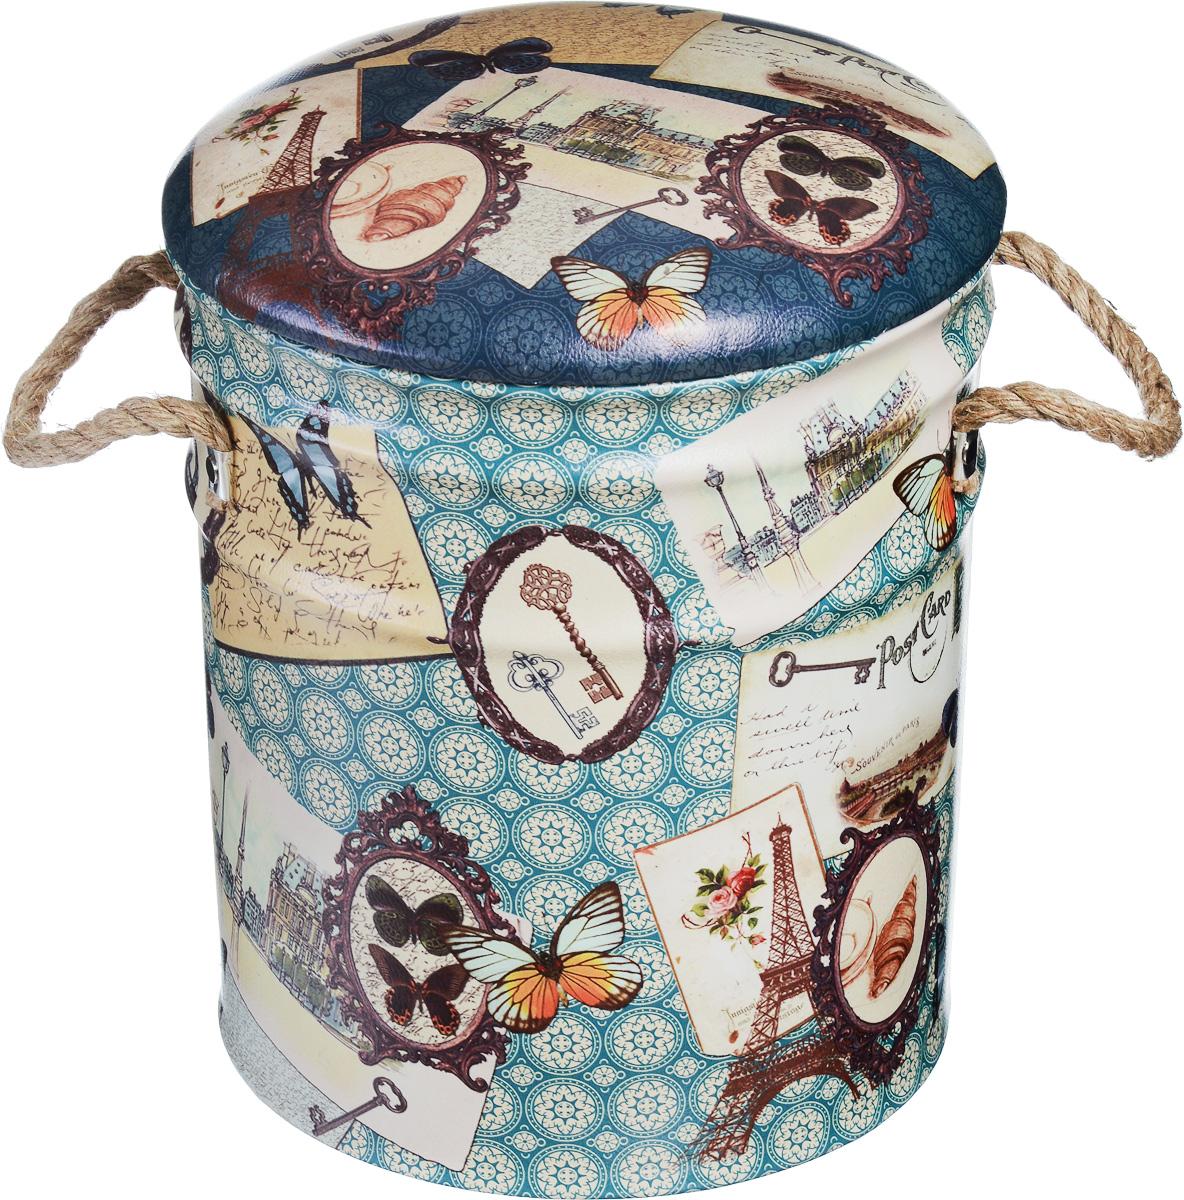 Пуфик Феникс-Презент «Бабочки», 30 х 30 х 38 см  пуфики мешки недорого в москве